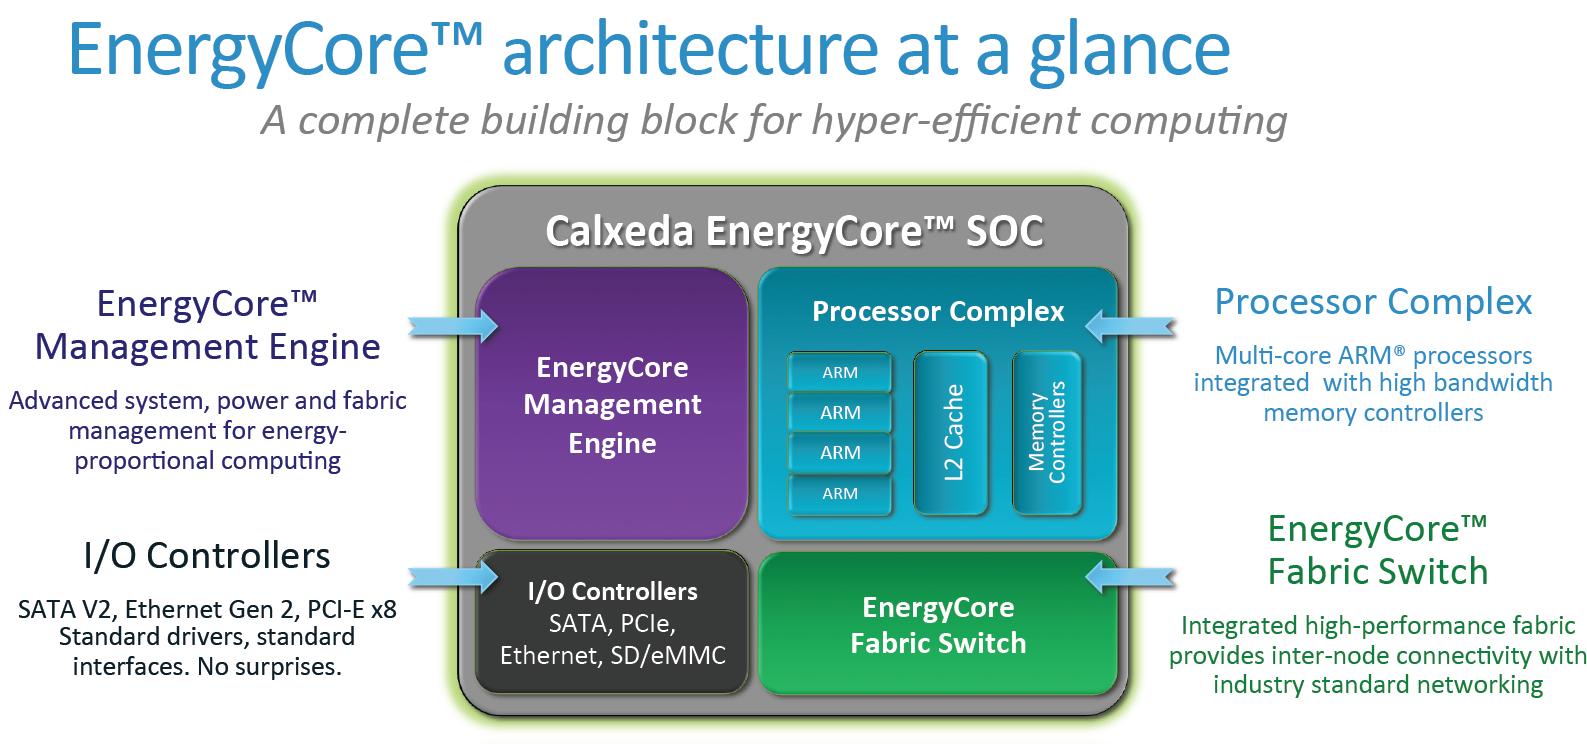 A Closer Look at the Server Node - Calxeda's ARM server tested